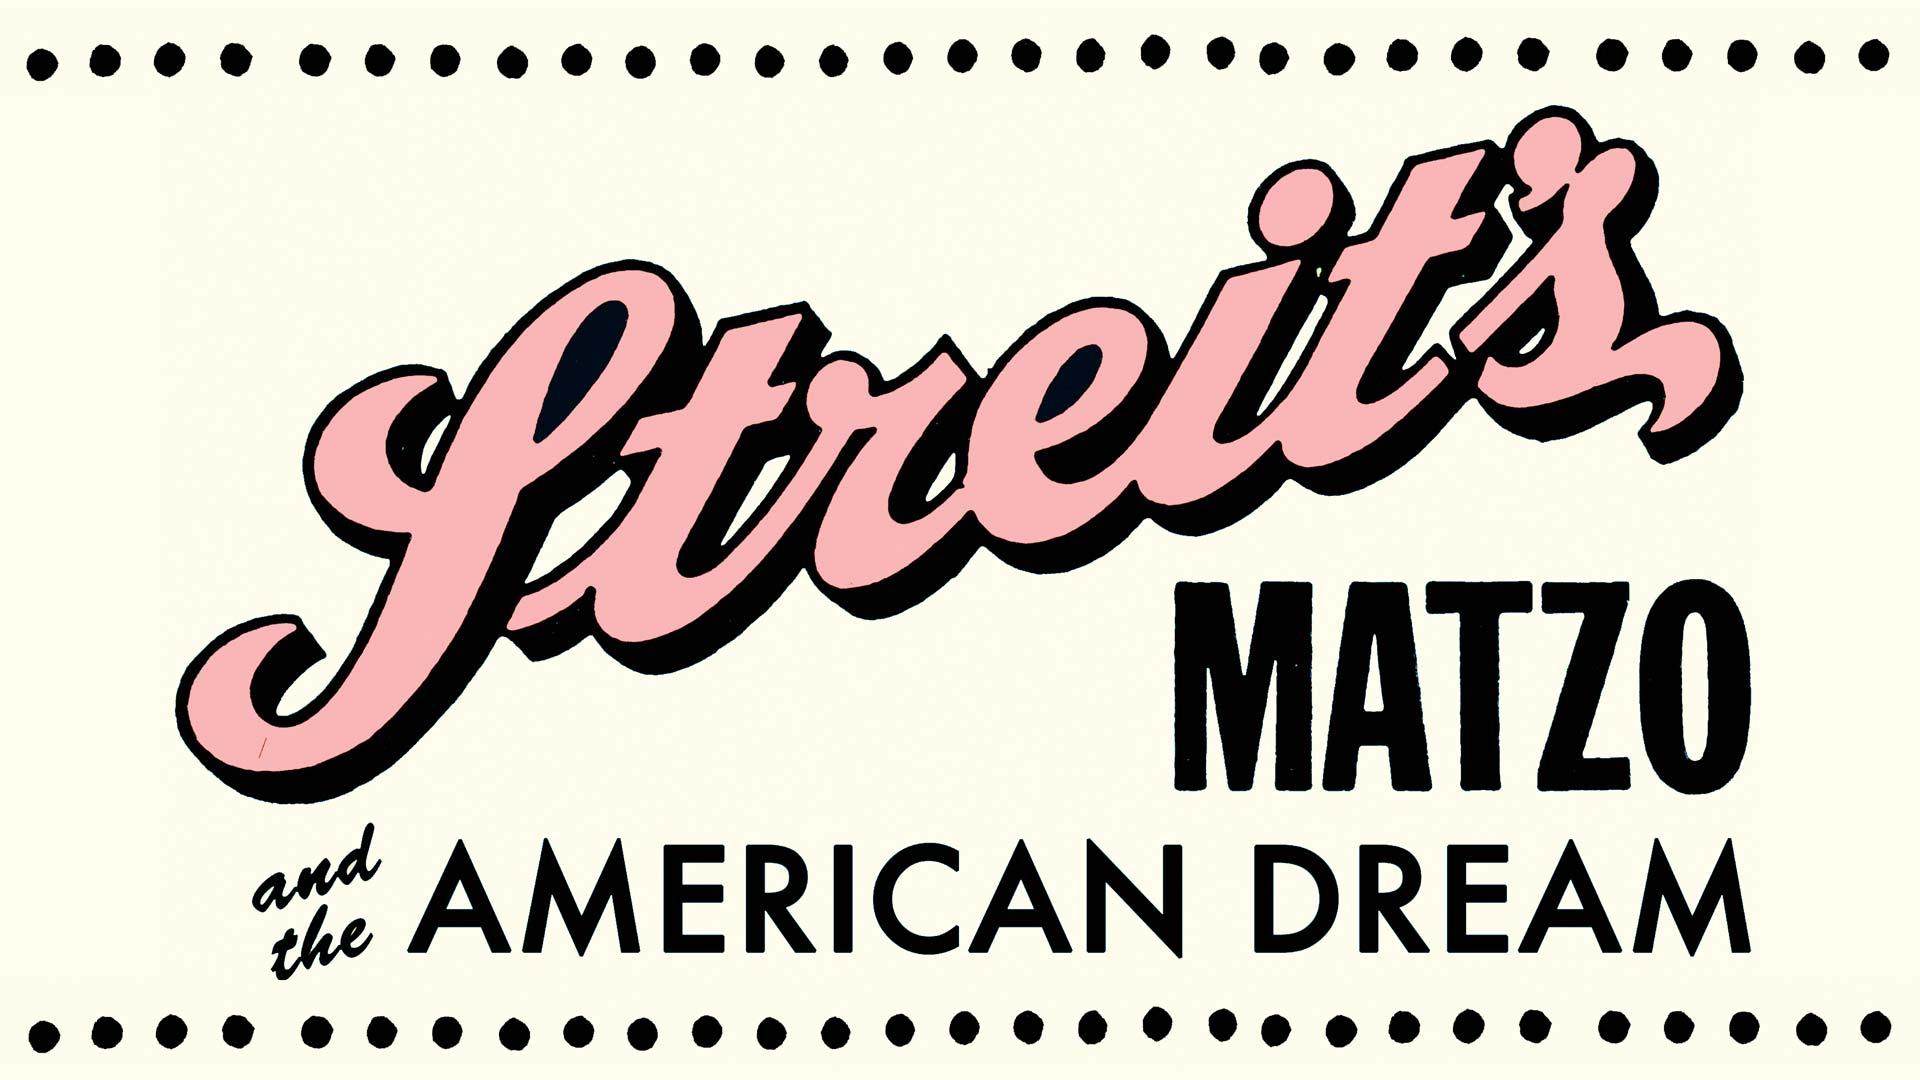 Streit's: Matzo and the American Dream - image